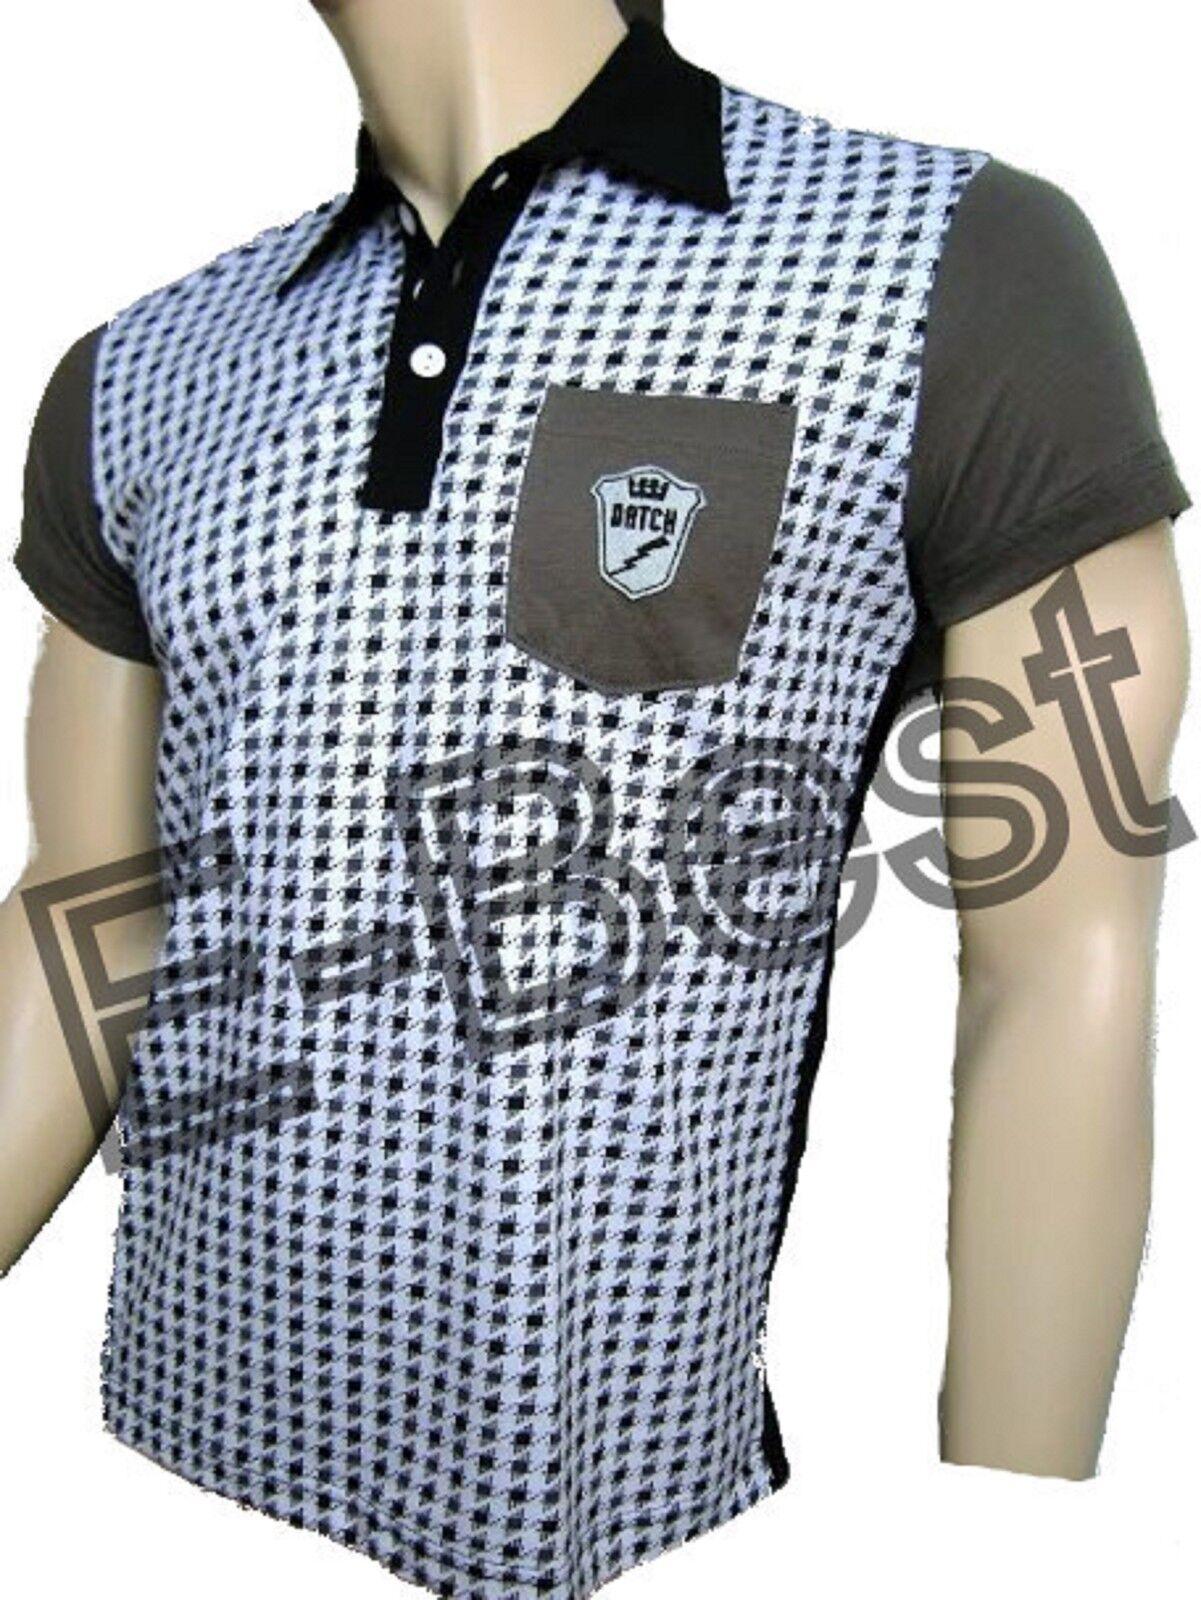 Polo T-Shirt Datch Short Short Short Sleeves Chess Men Man 57K1025 402 176df7